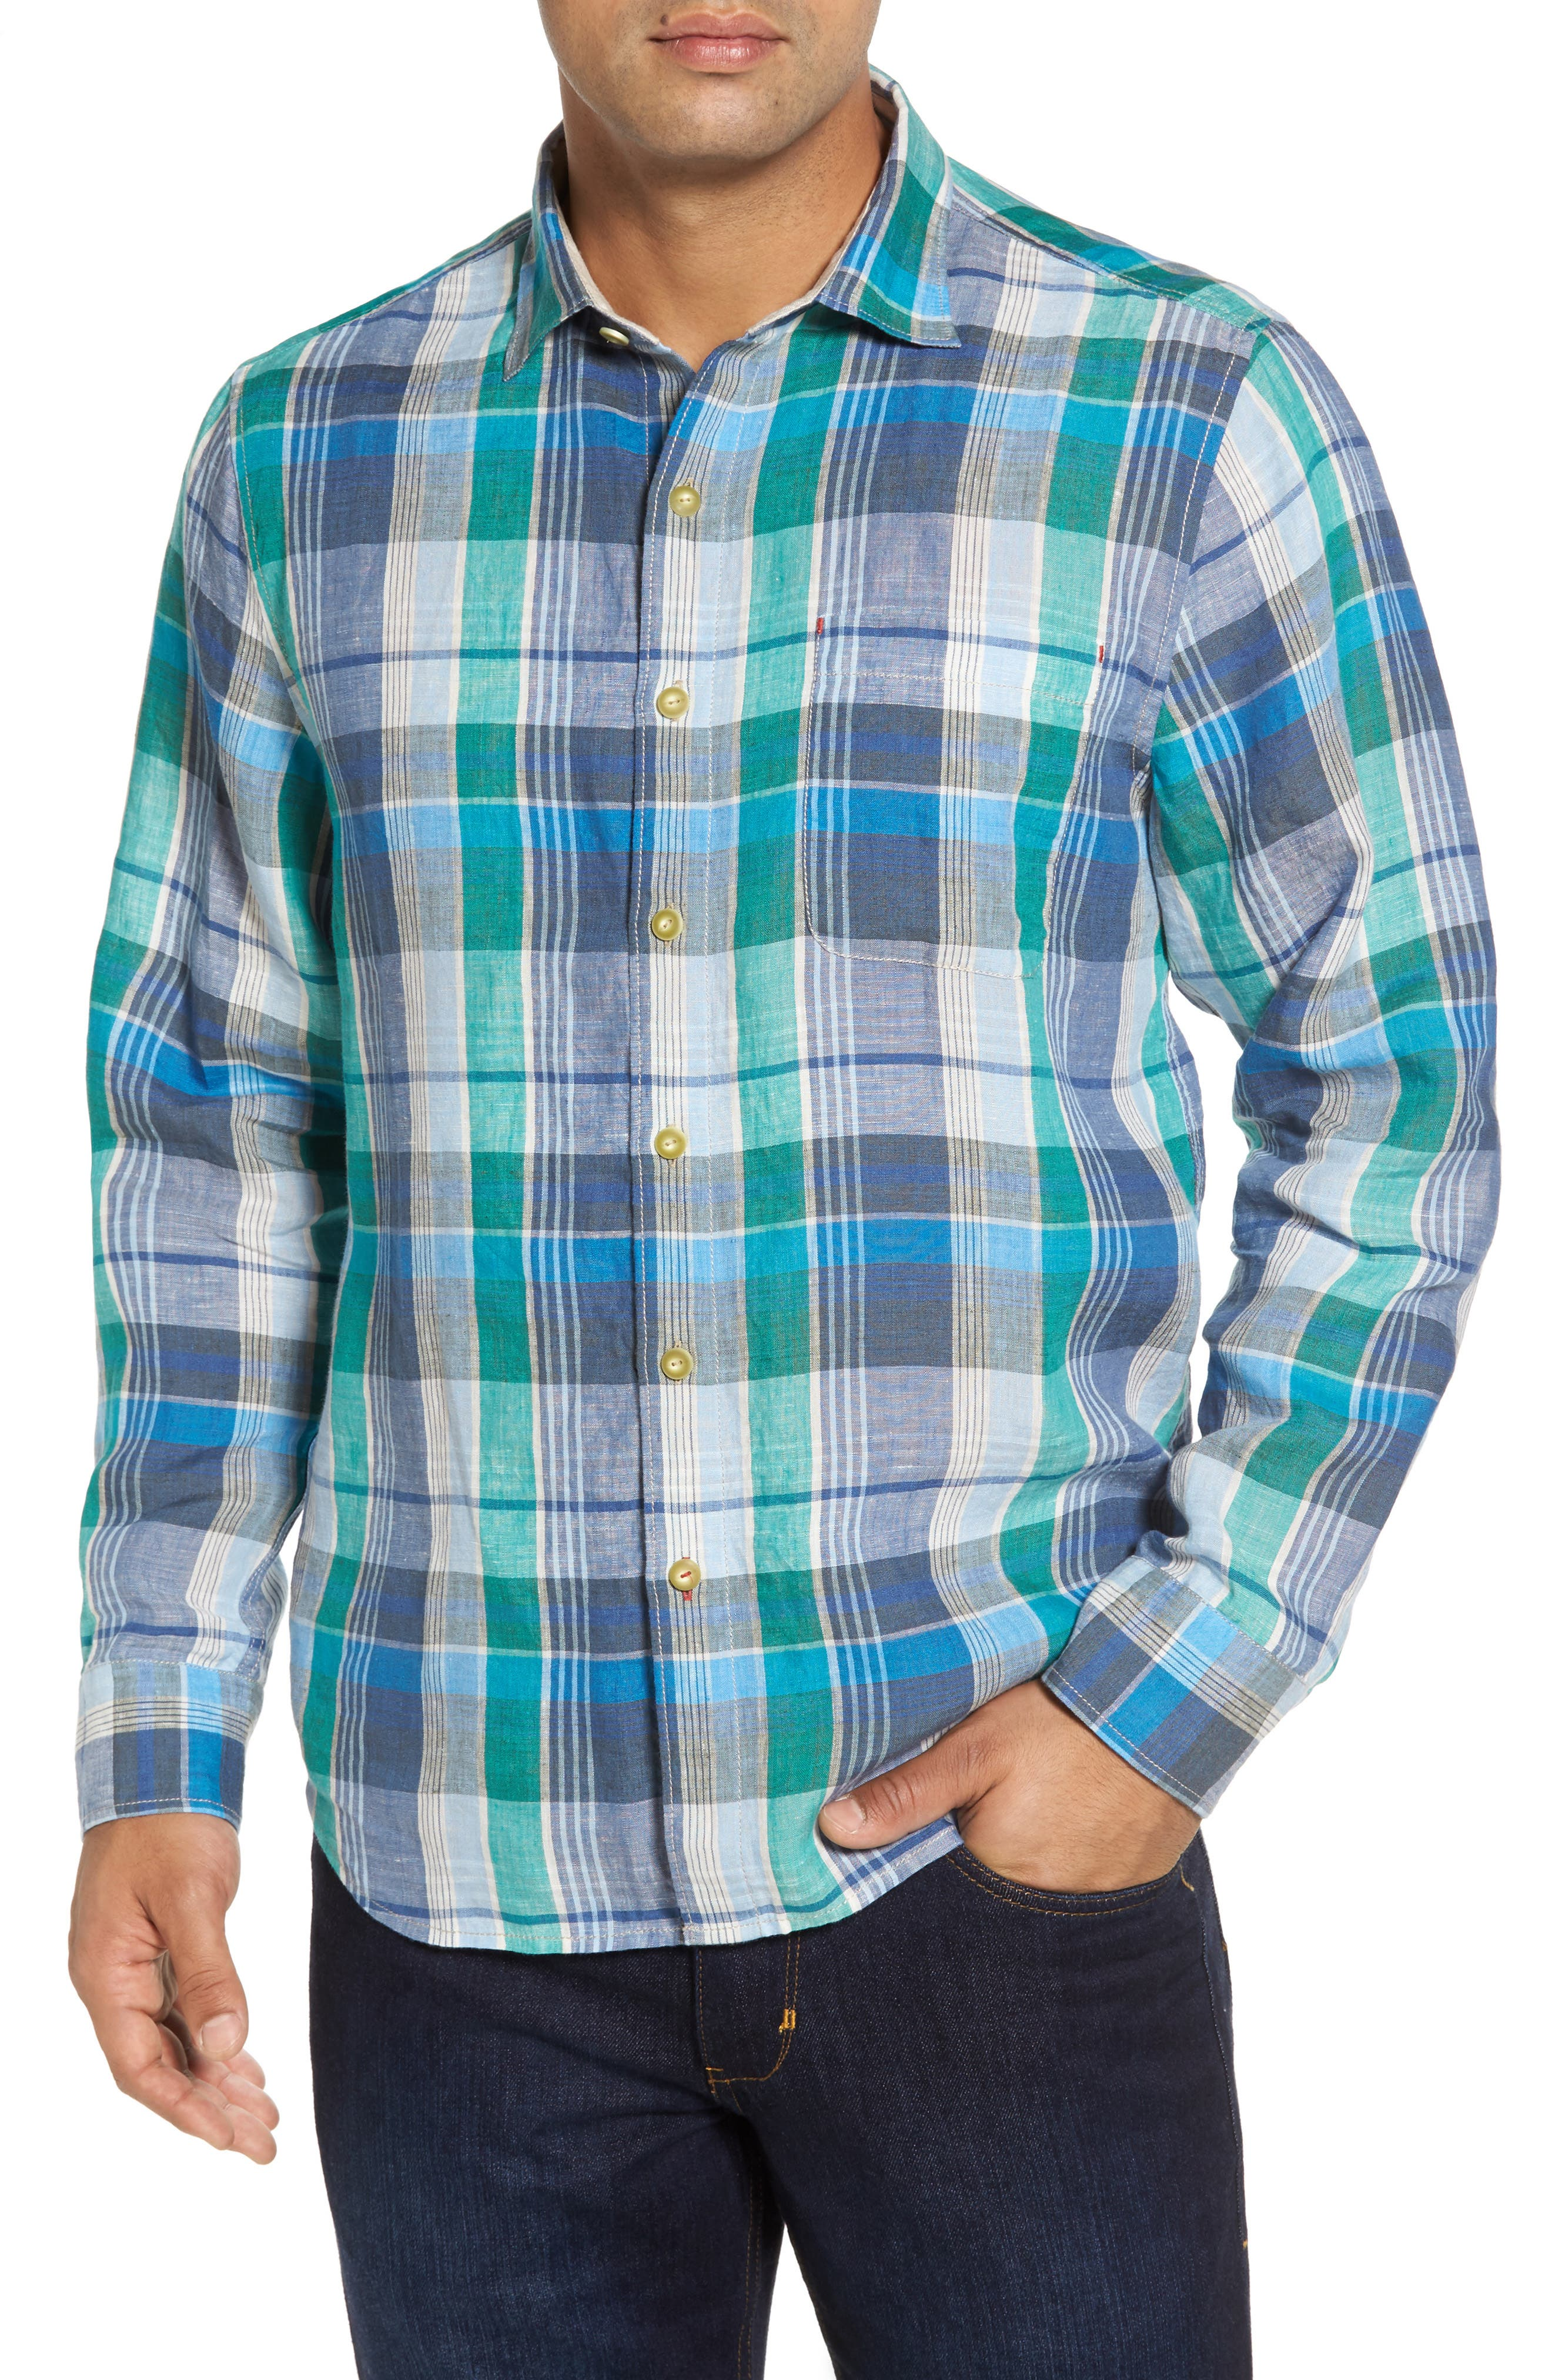 TOMMY BAHAMA,                             Vero Beach Madras Plaid Linen Sport Shirt,                             Main thumbnail 1, color,                             300